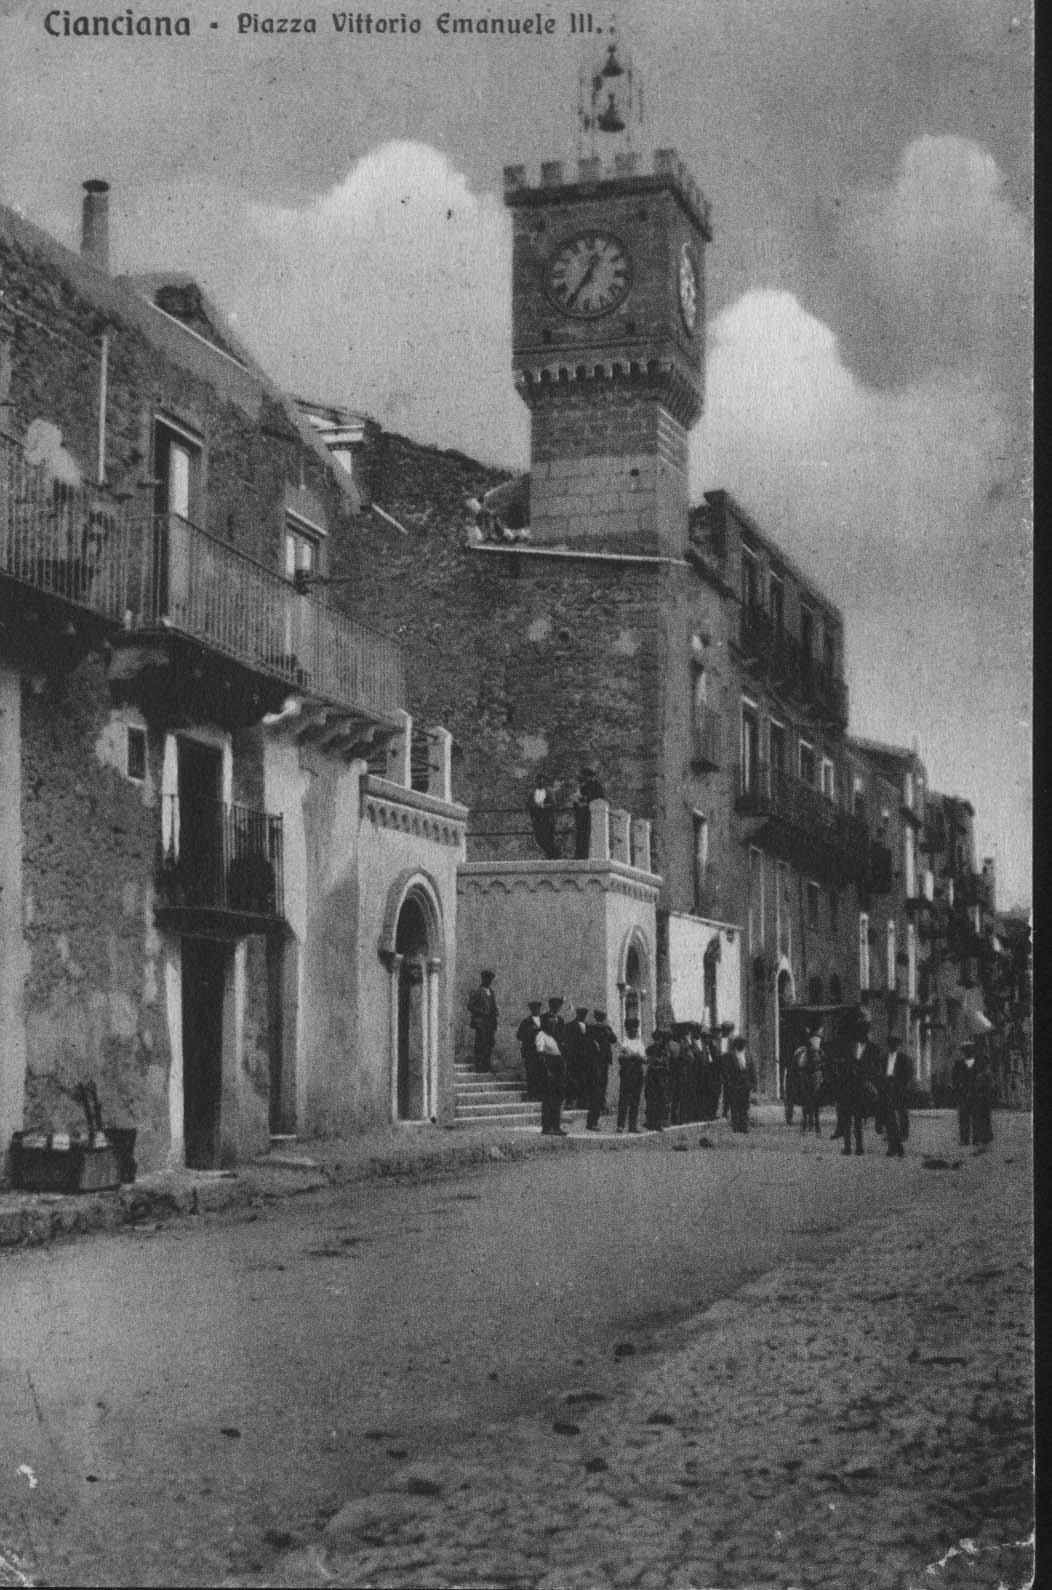 Torre Orologio 1